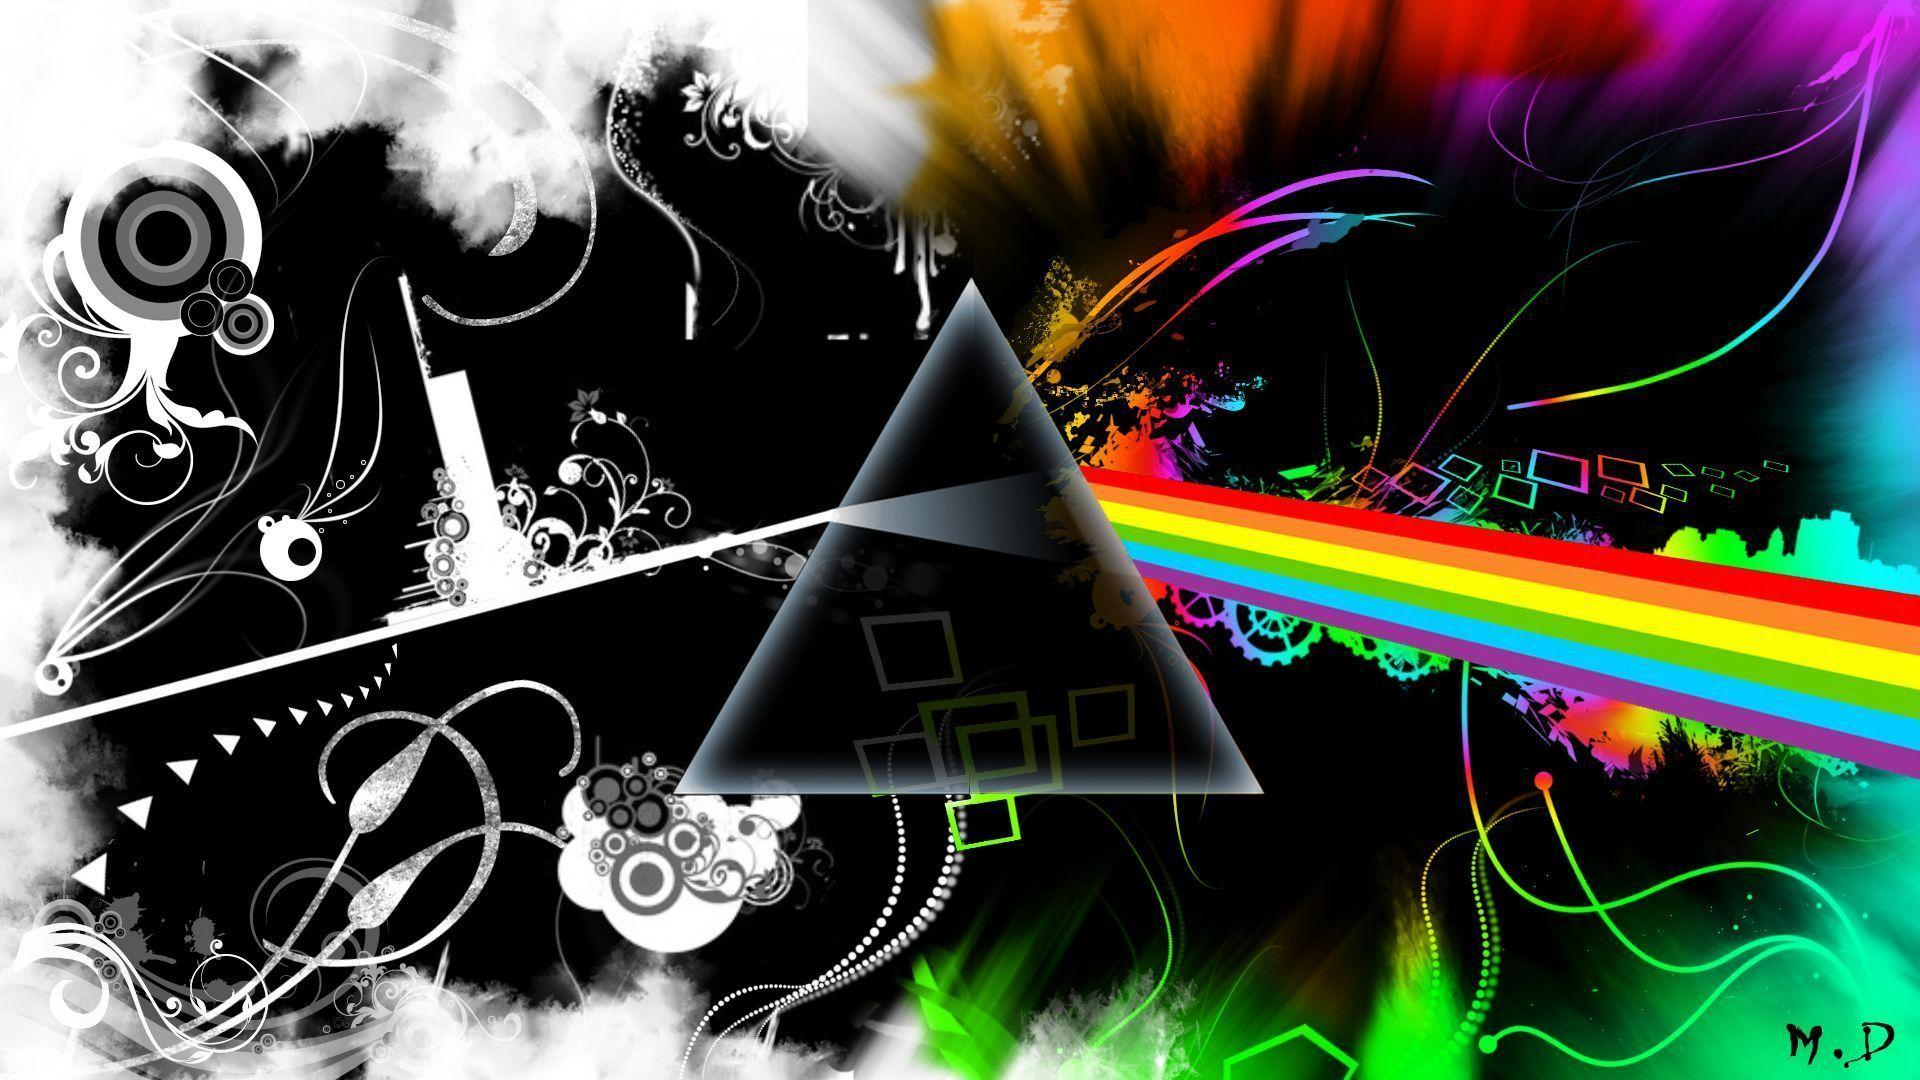 Pink Floyd Wallpapers 1920x1080